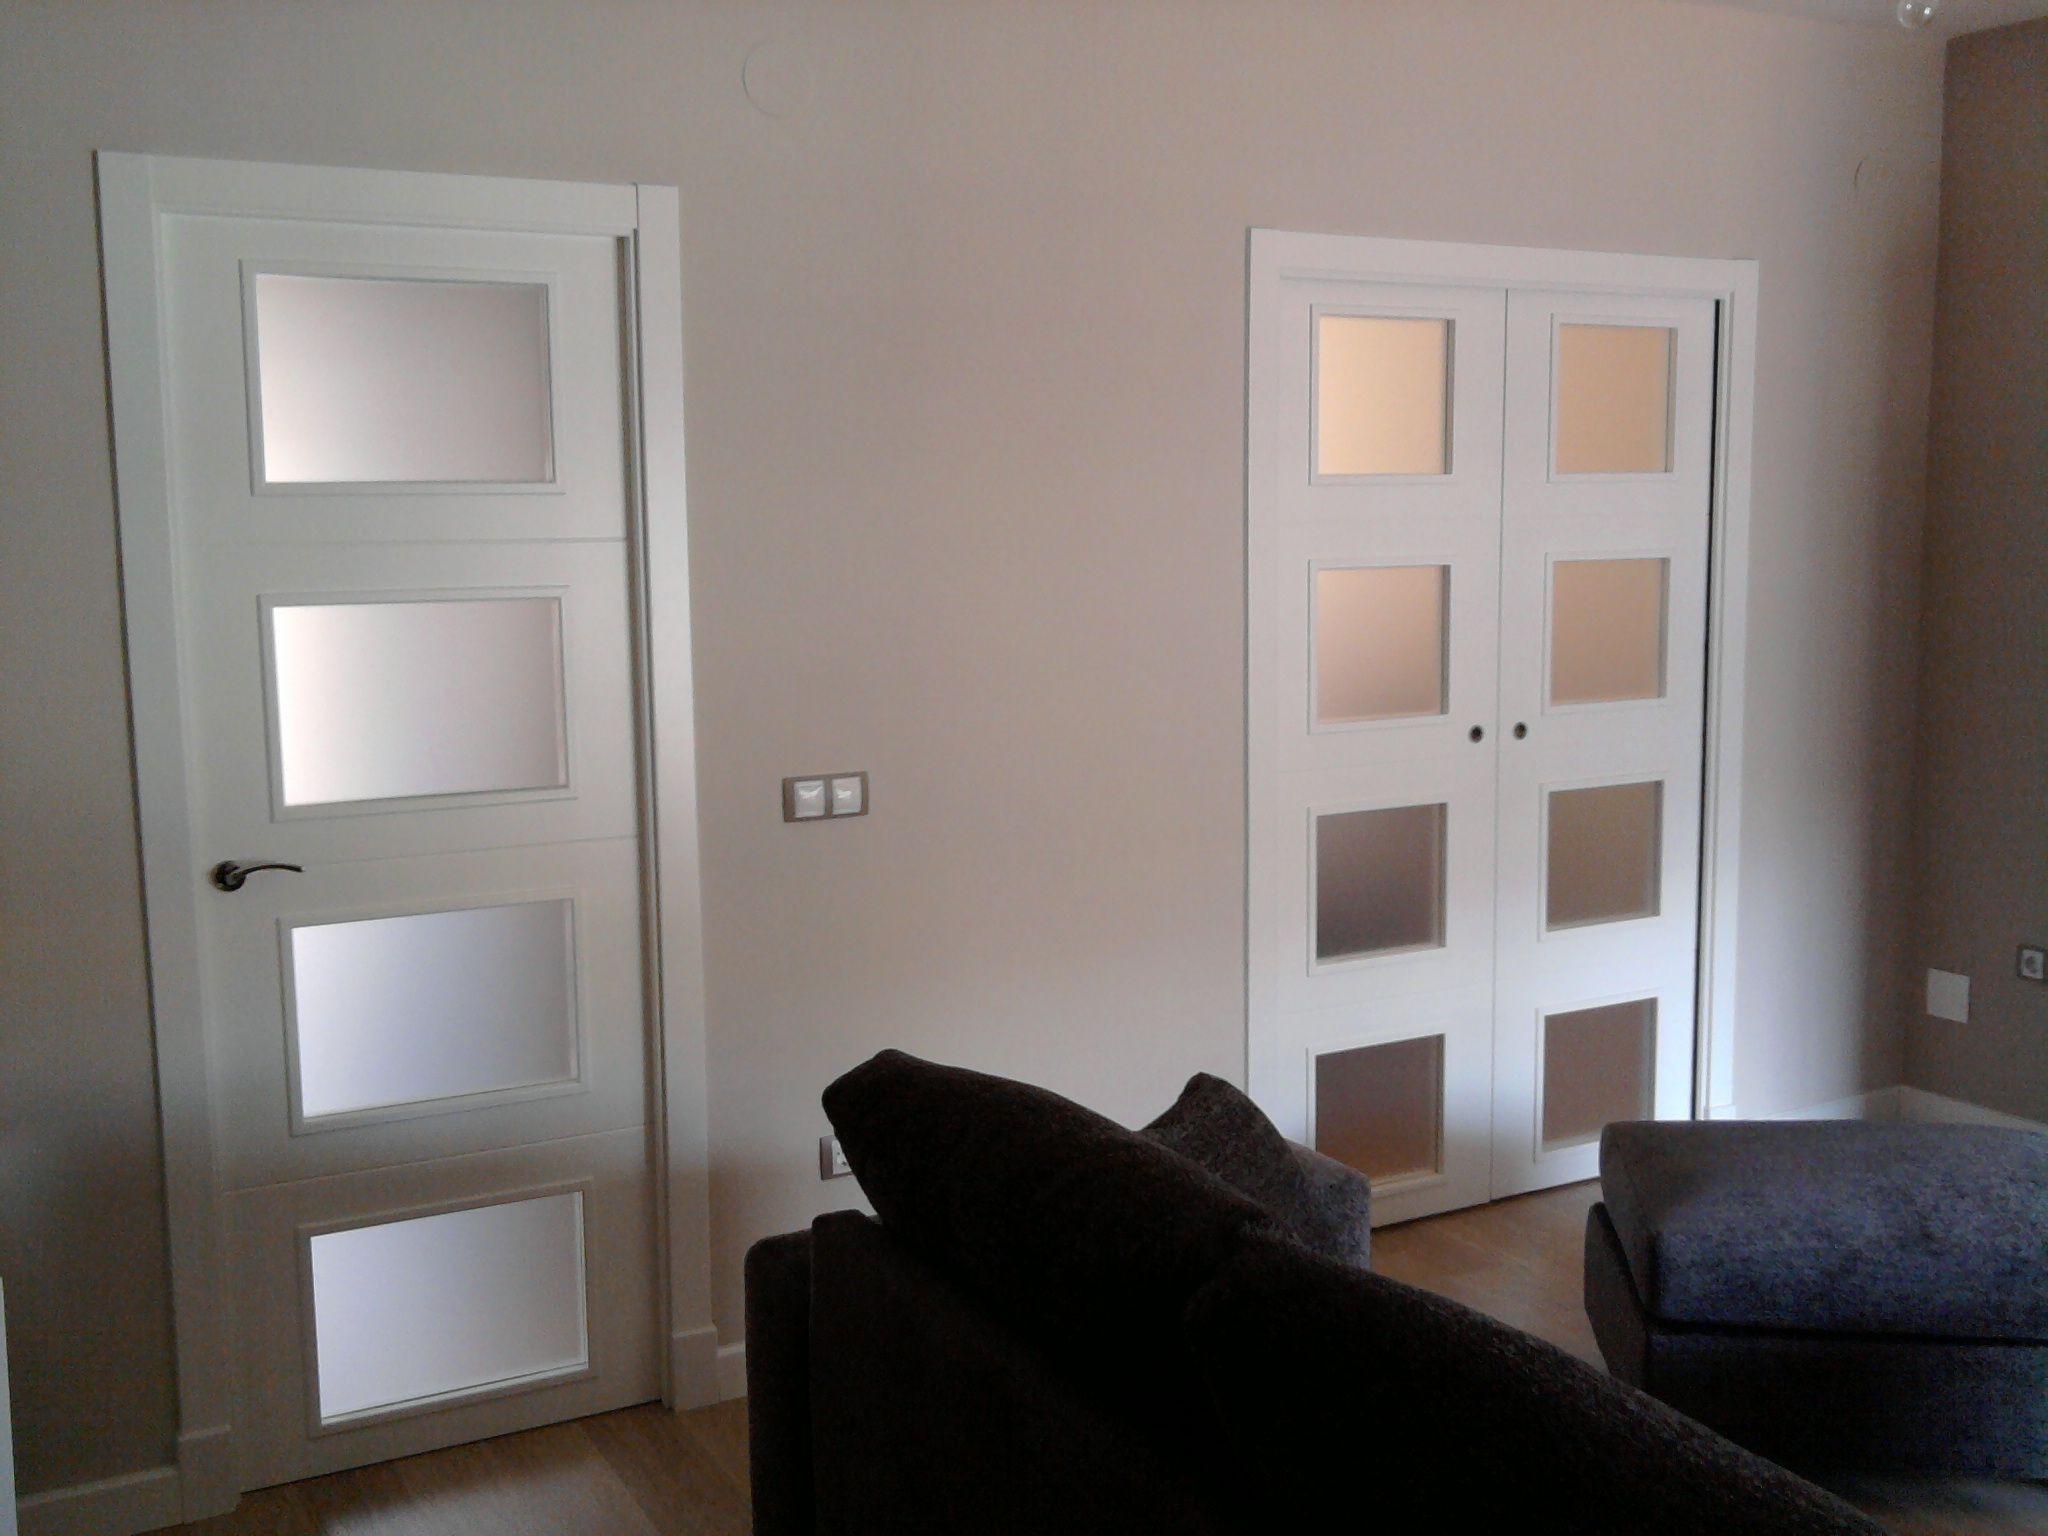 Modelo 5T12 V57 con cristal mate, puerta abatible y puerta doble ...